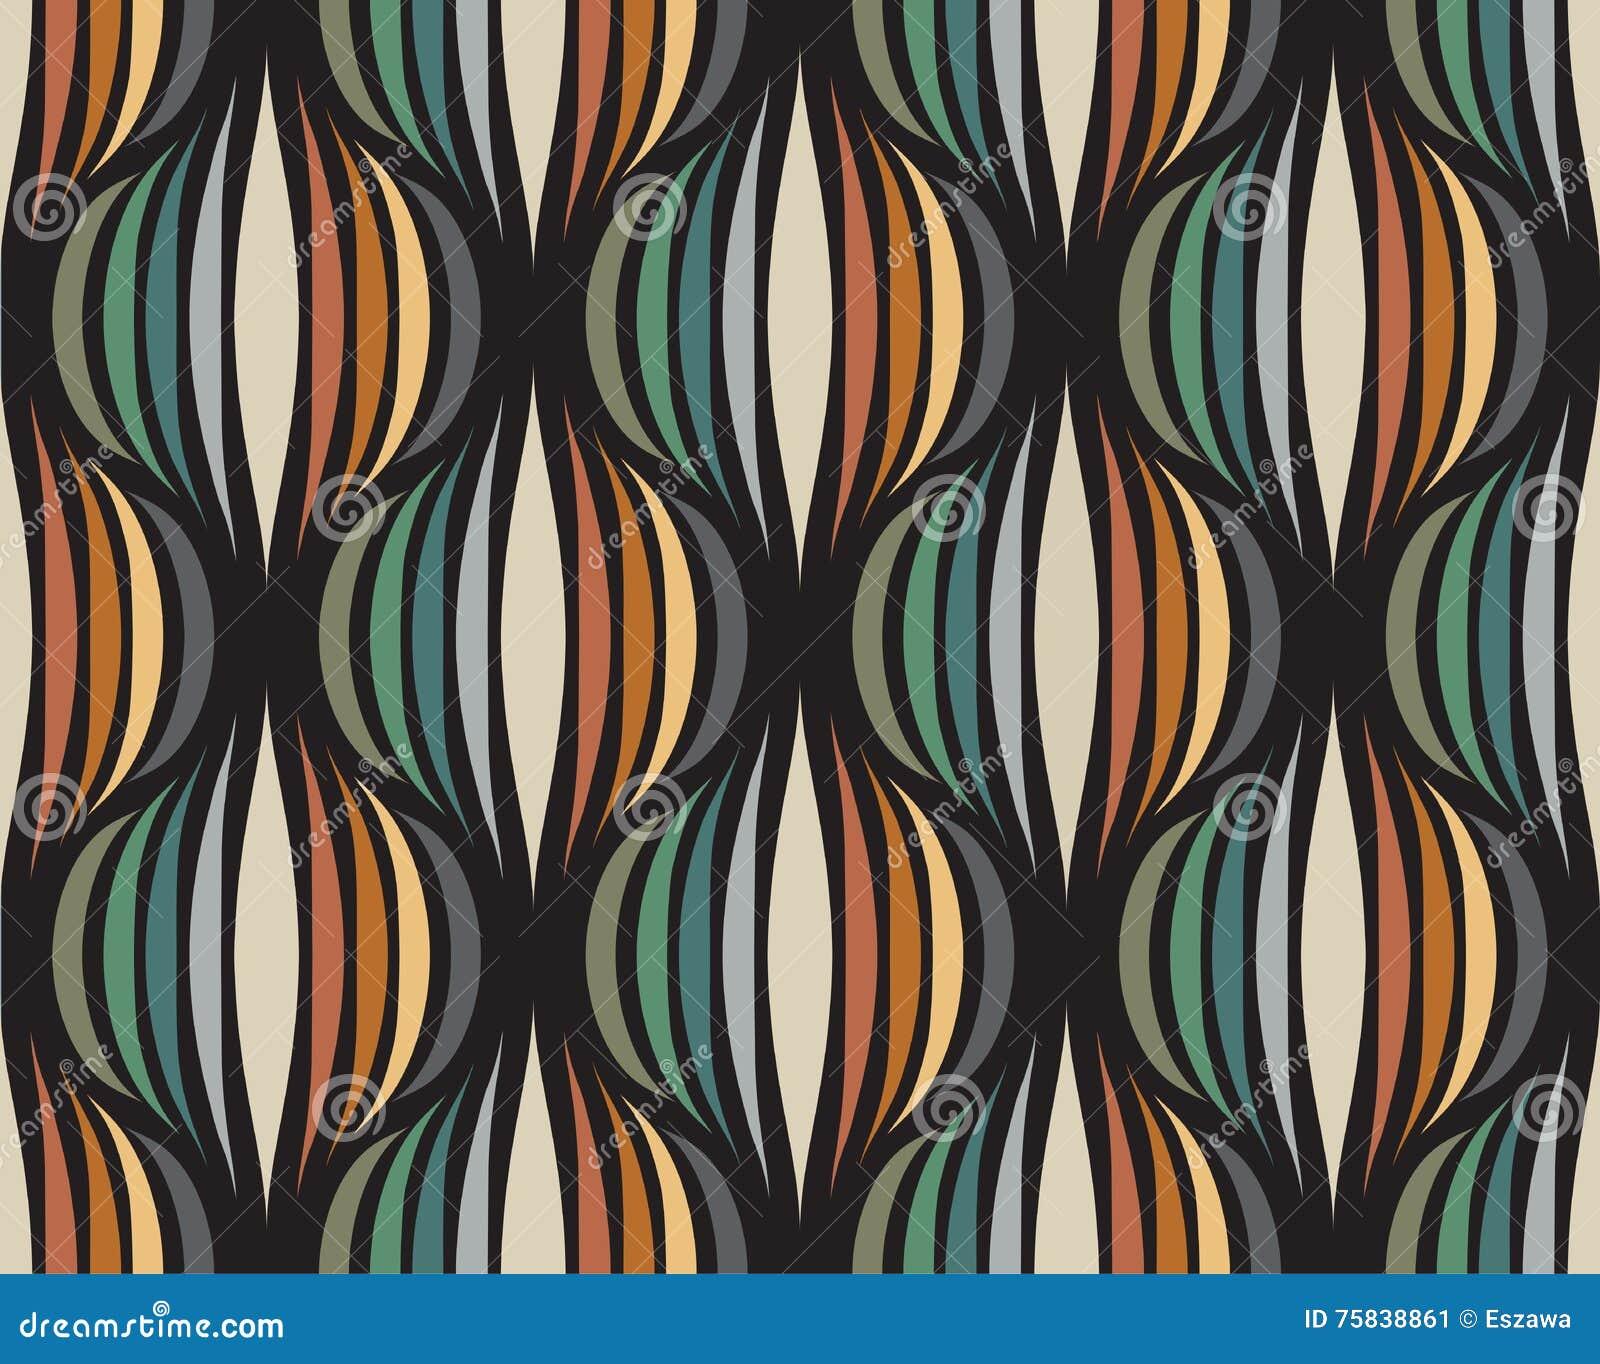 Ретро повторяющийся обои - винтажная картина вектора